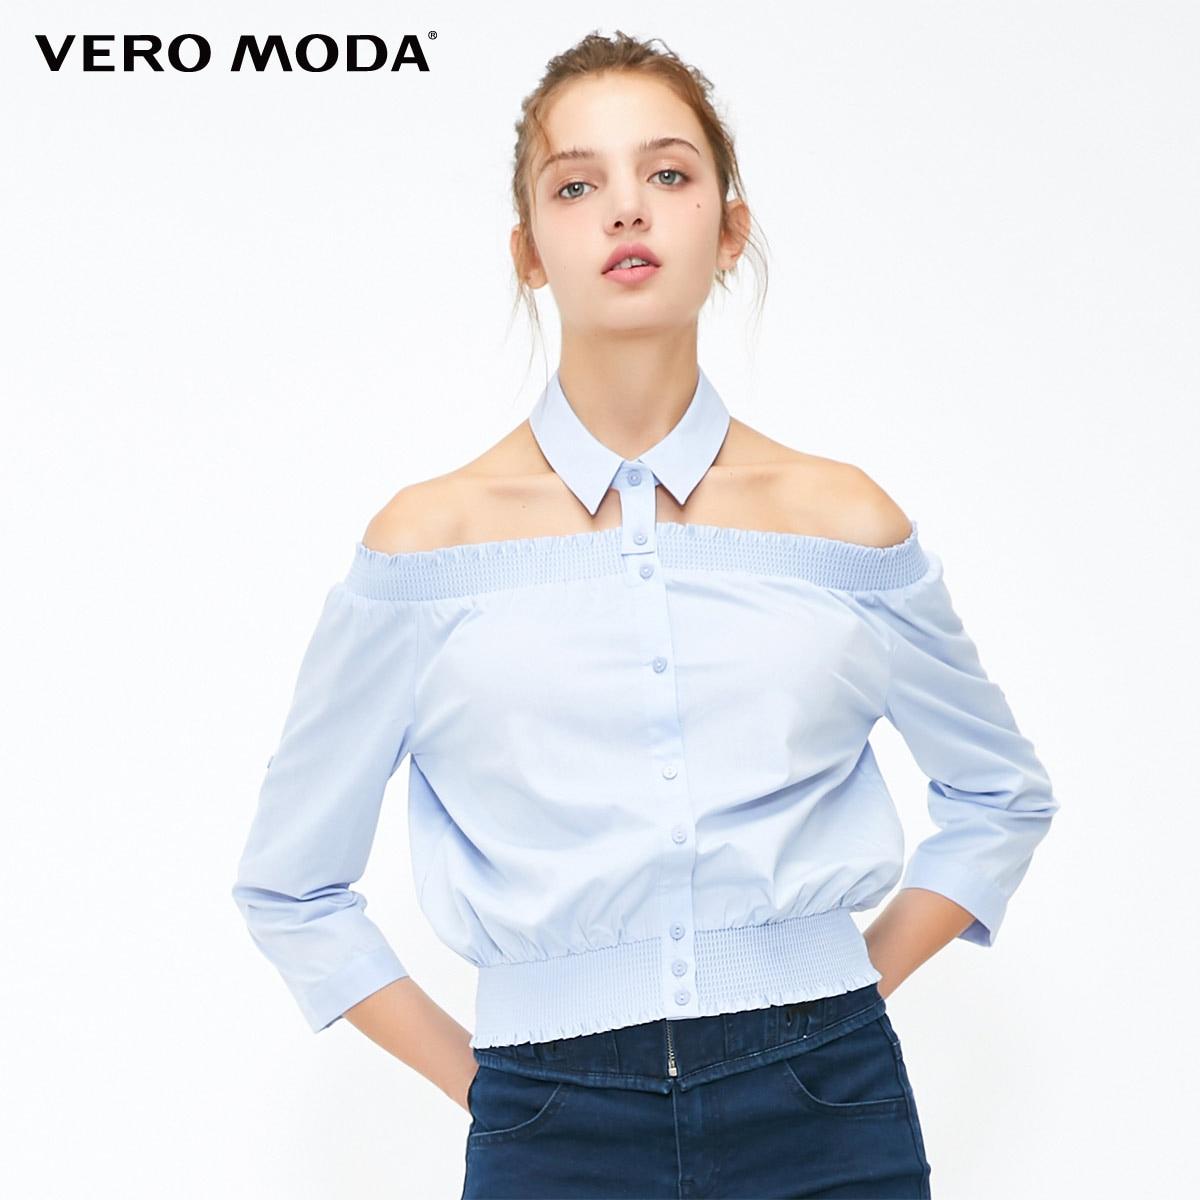 Vero Moda Women's Choker Boat Neck Short Shirt | 319131501